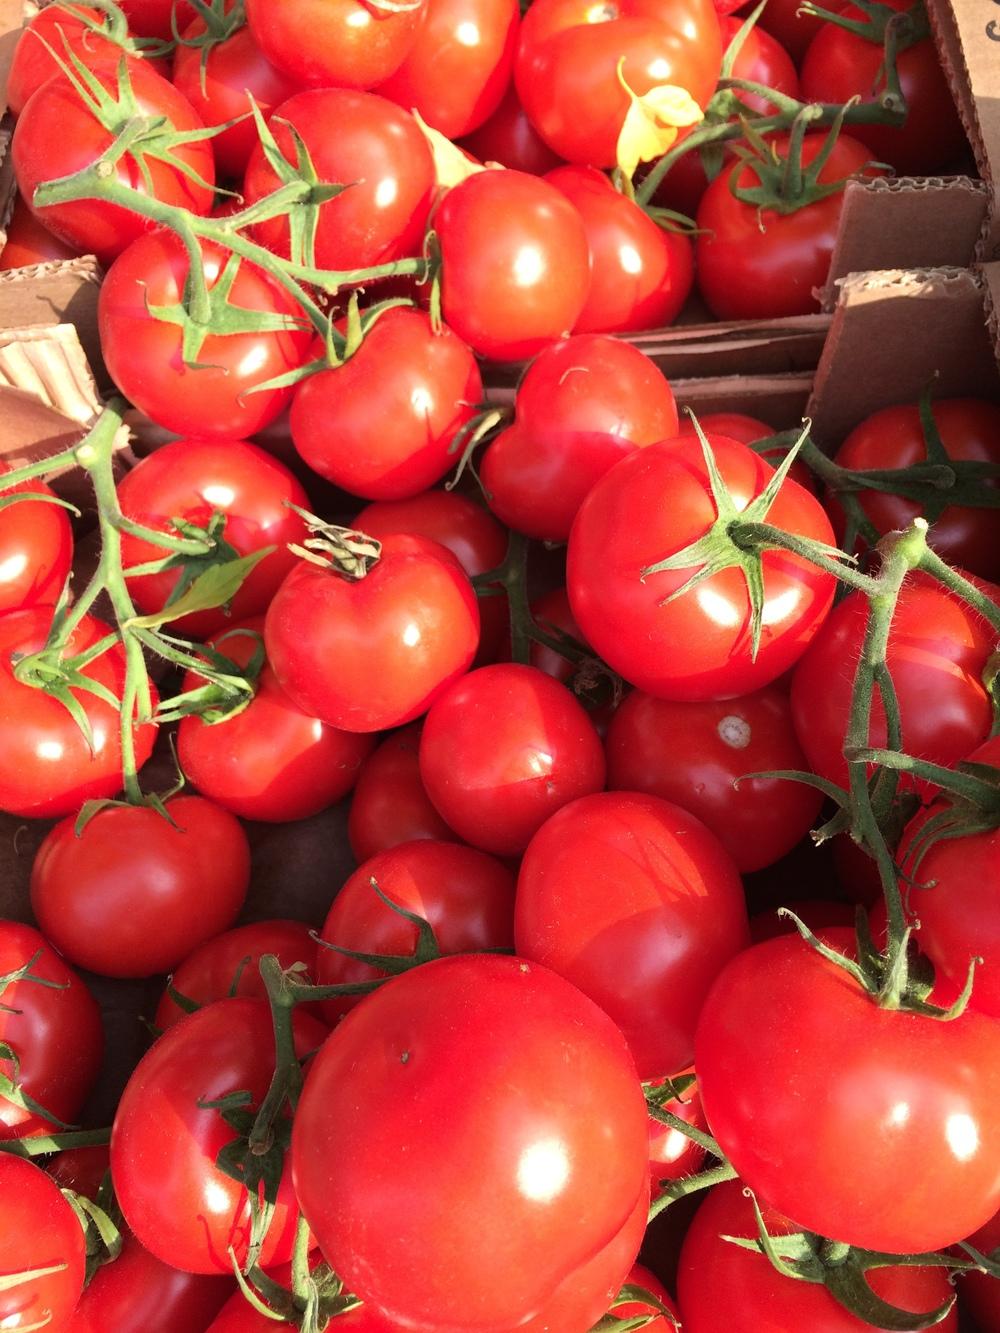 Tomatoes are amazing